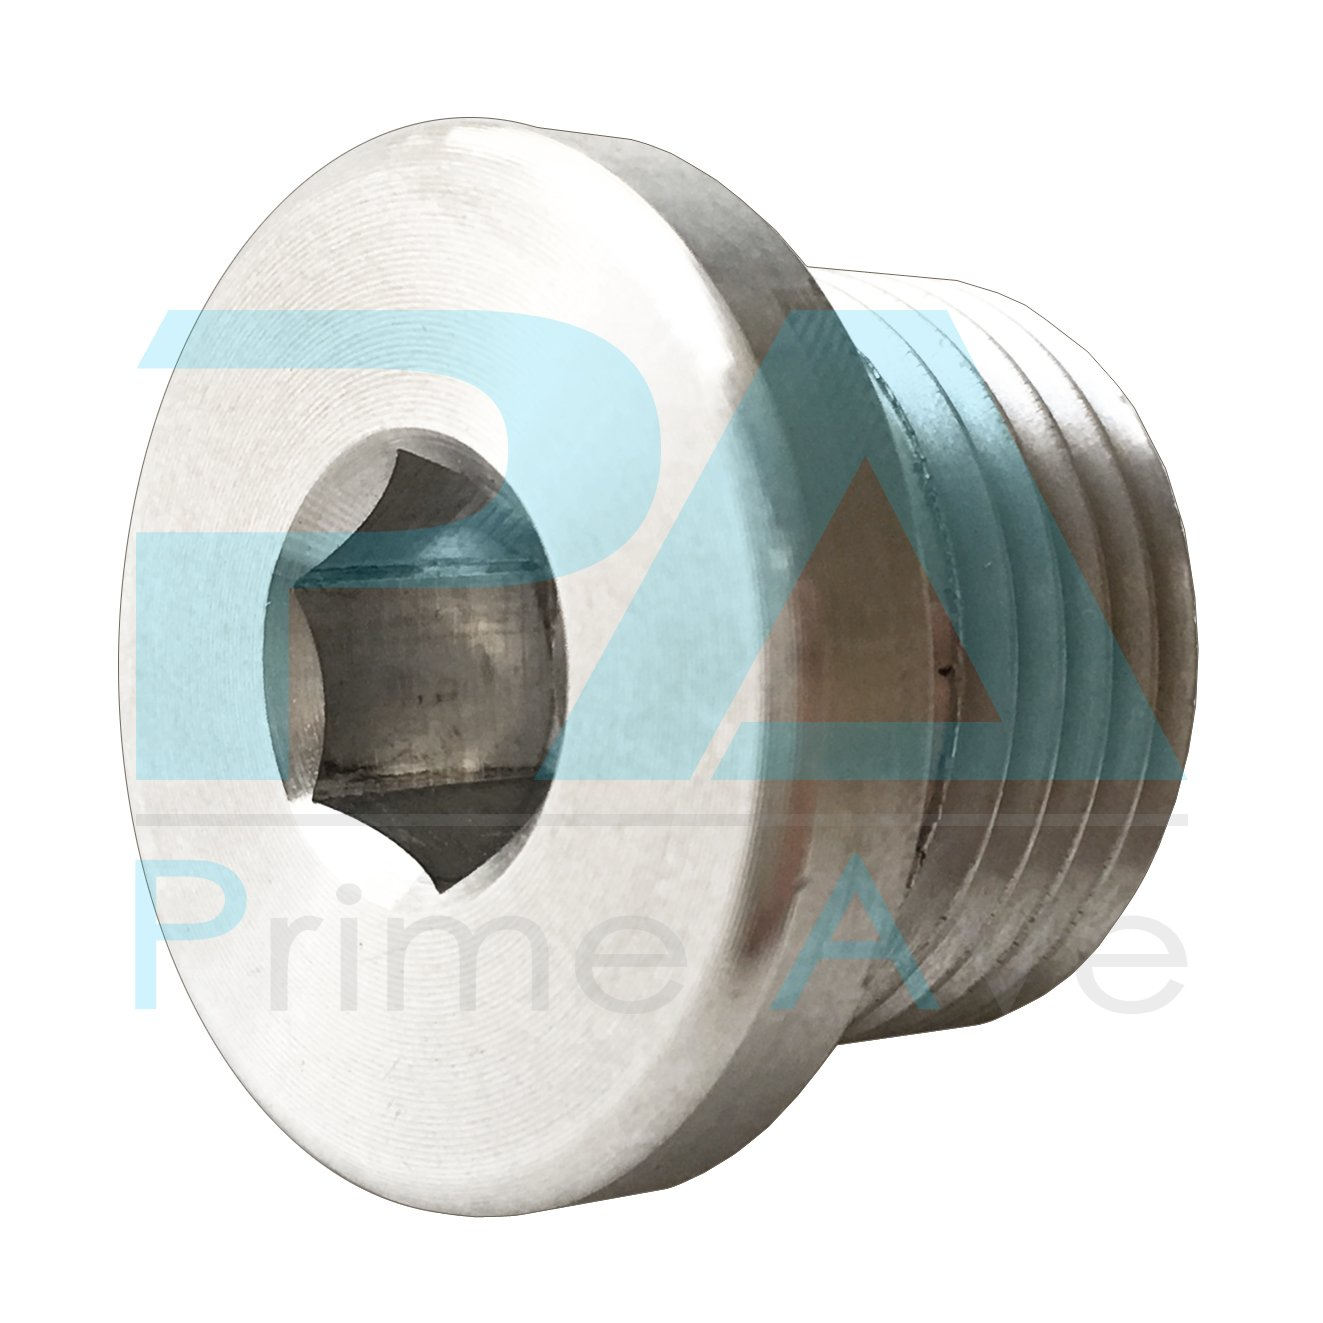 PA (2) OEM Aluminum Oil Drain Plug + (10) Crush Aluminum Gasket Washers For Porsche Prime Ave